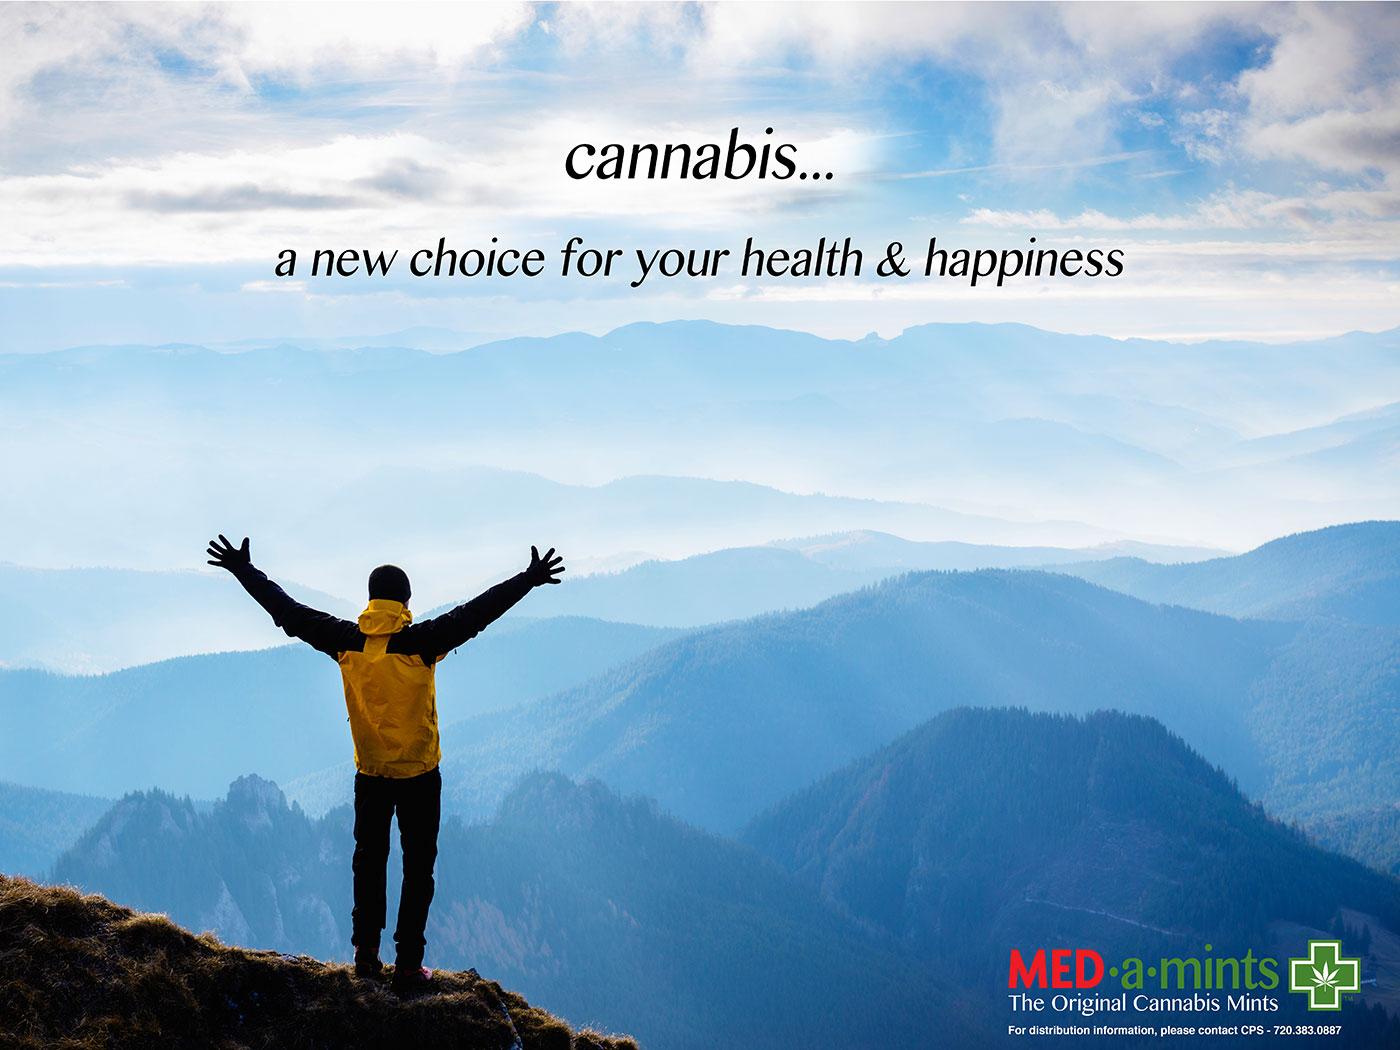 medamints-yay-cannabis-mountain-guy-web